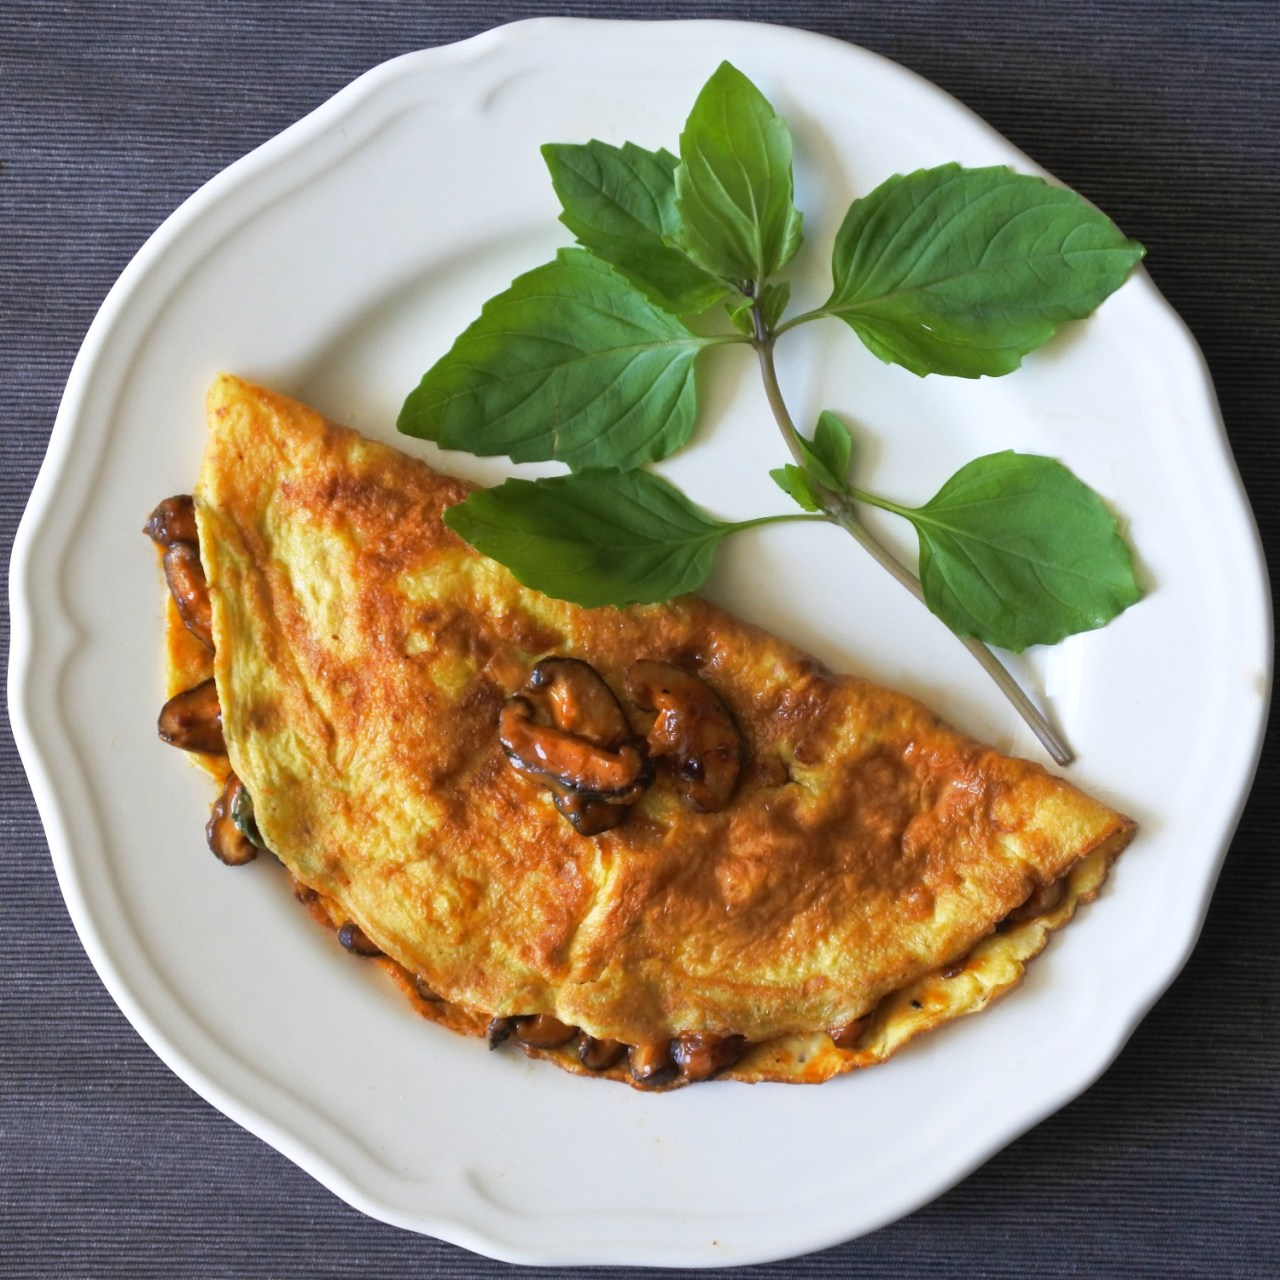 Thai Chili Mushroom Omelette